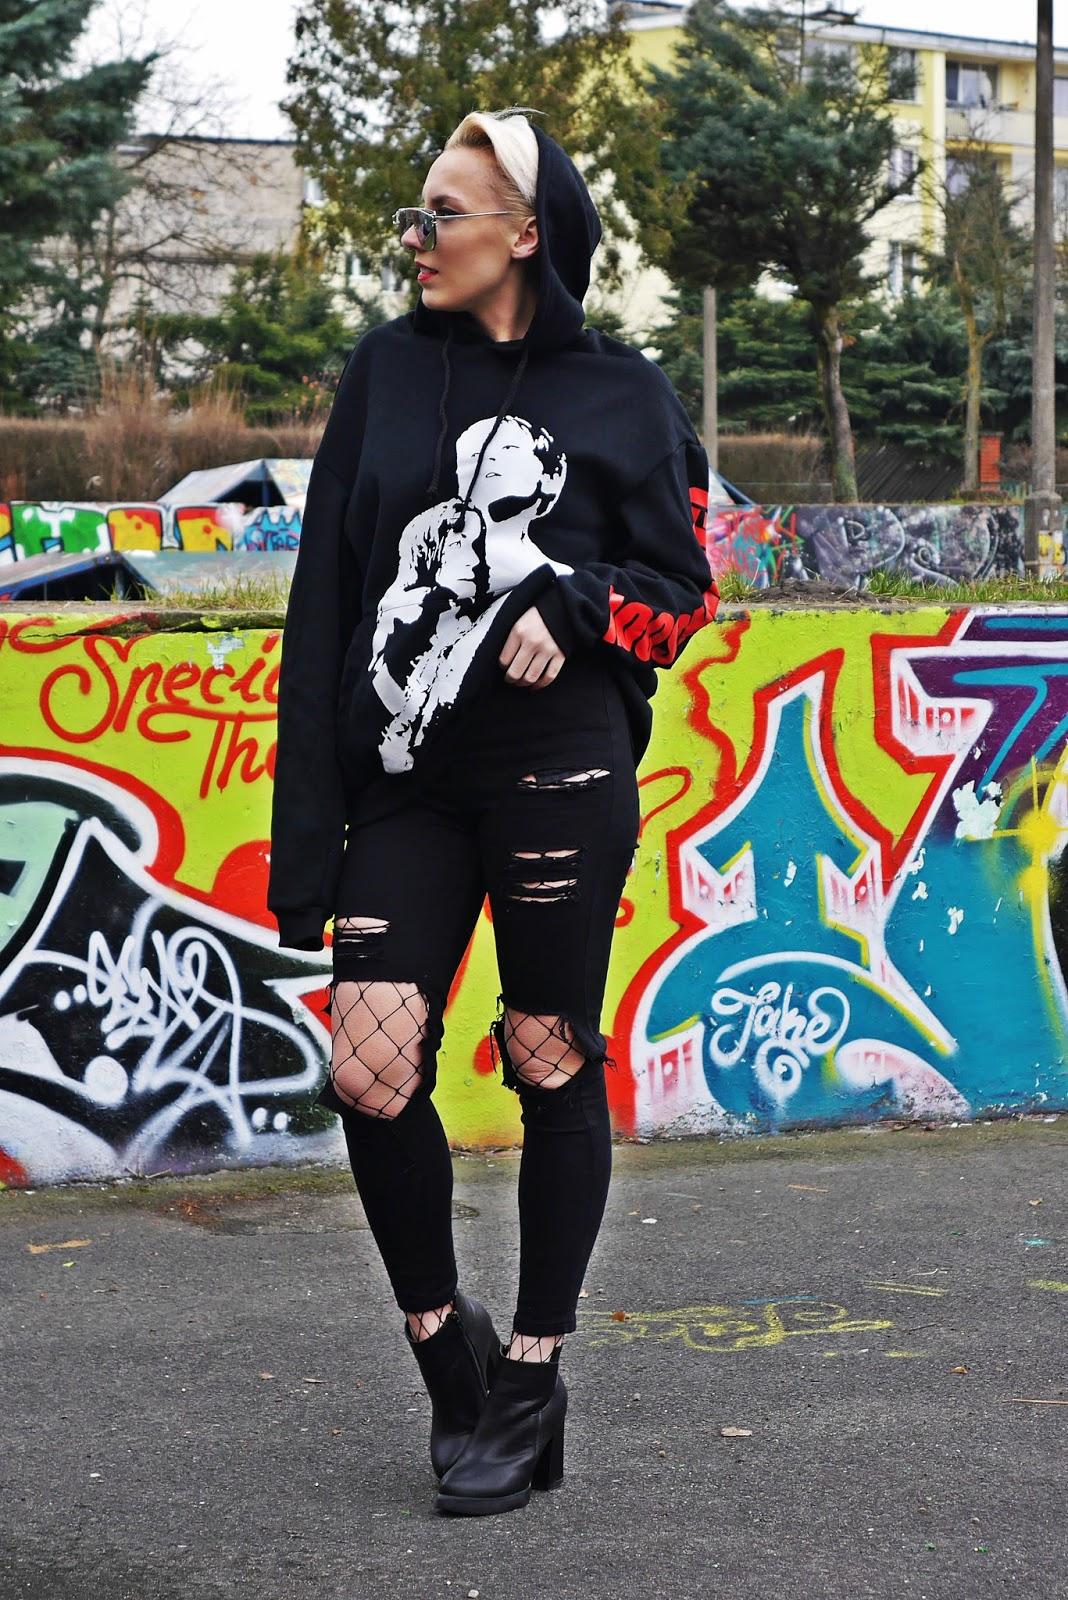 blogerka_modowa_pulawy_blog_modowy_karyn_look_210317a